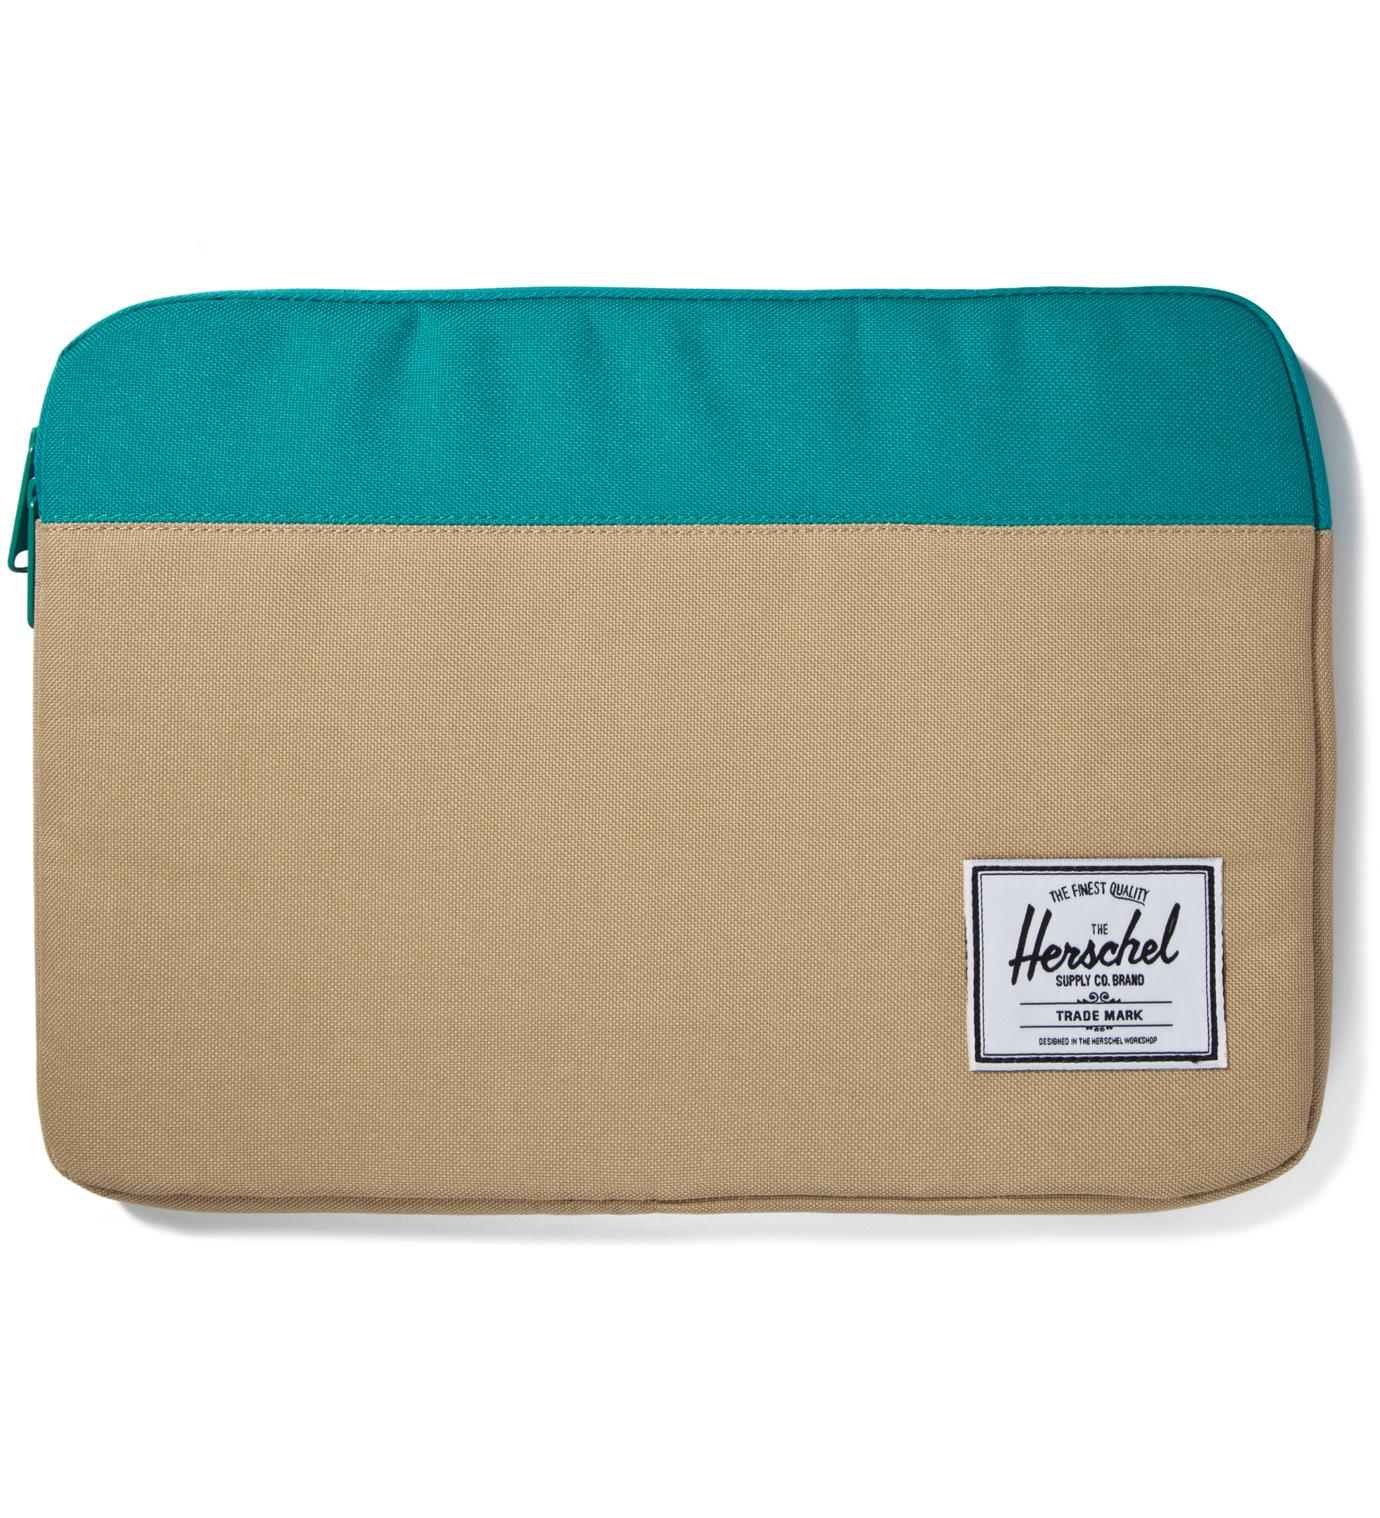 "Herschel Supply Co. Khaki/Teal Anchor Sleeve for 13"" Macbook Pro"